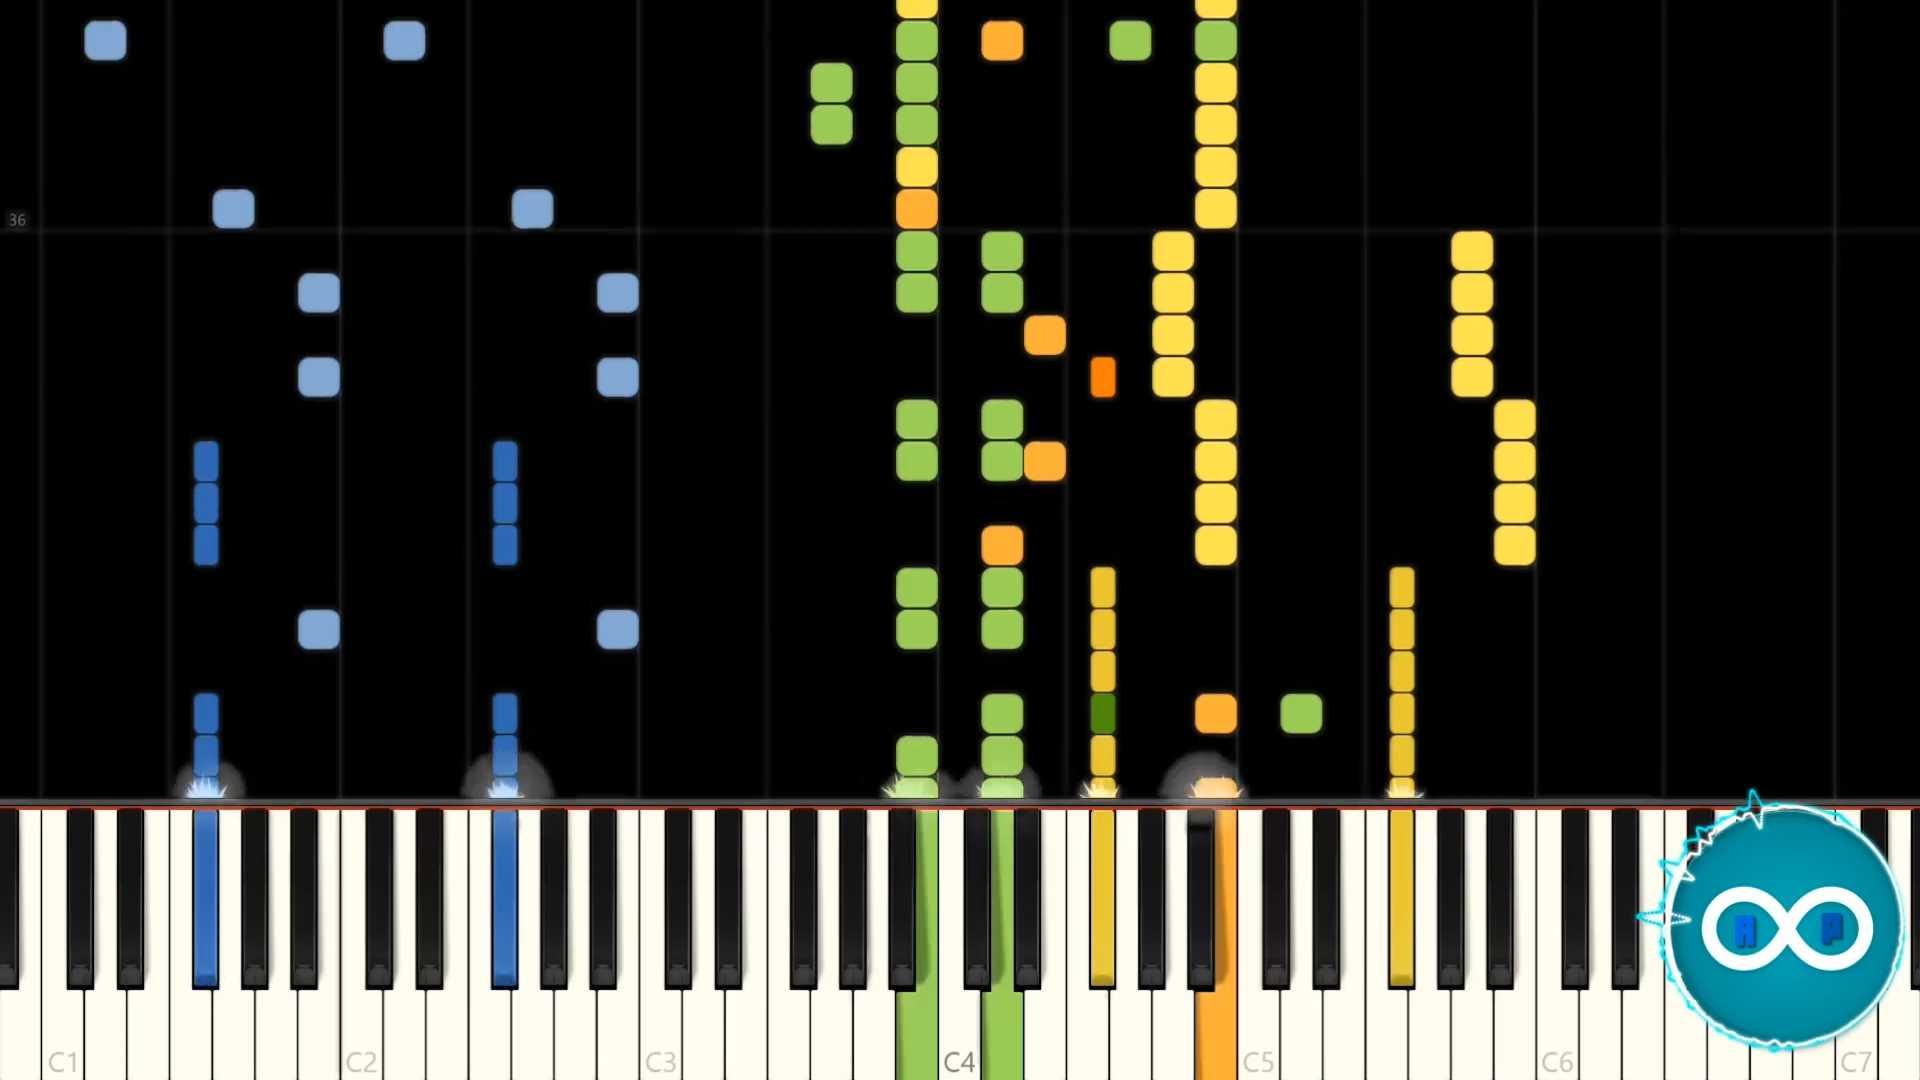 Major Lazer – Get Free piano midi synthesia cover